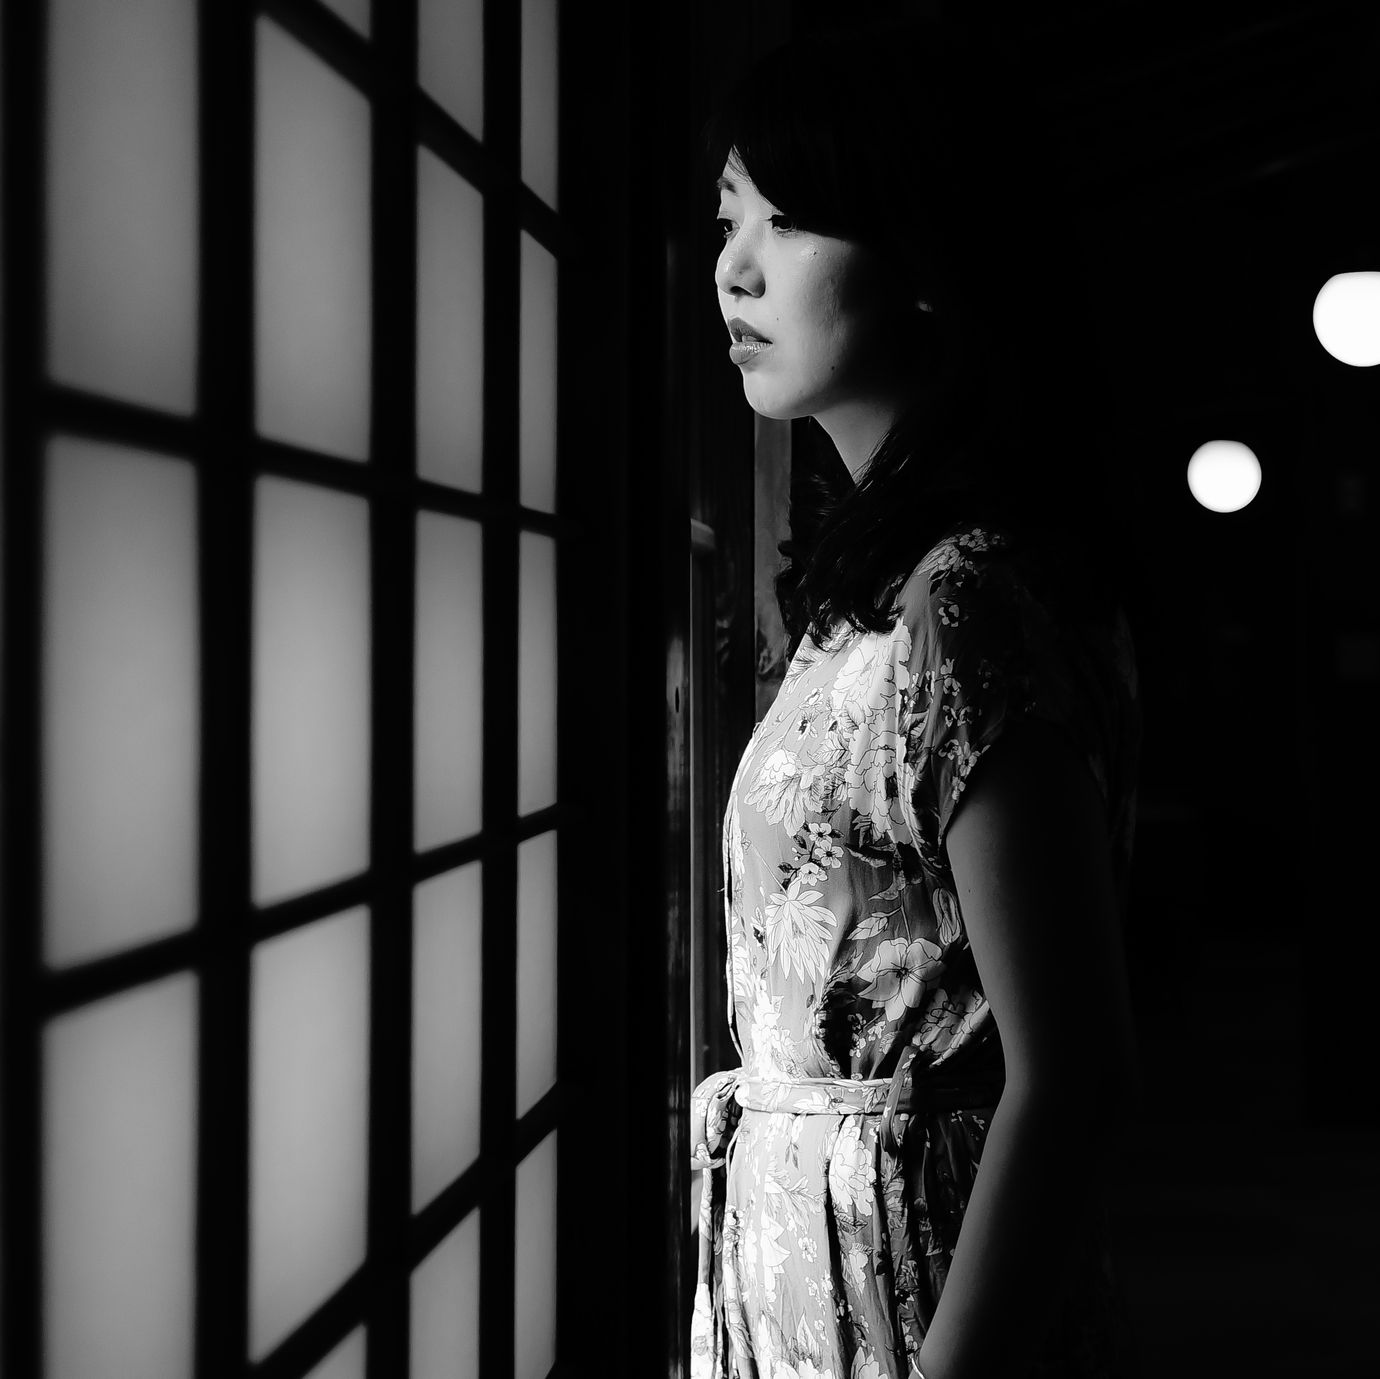 july,2020 ポートレート写真展「一期一会」in NADAR東京_d0231029_1344690.jpg